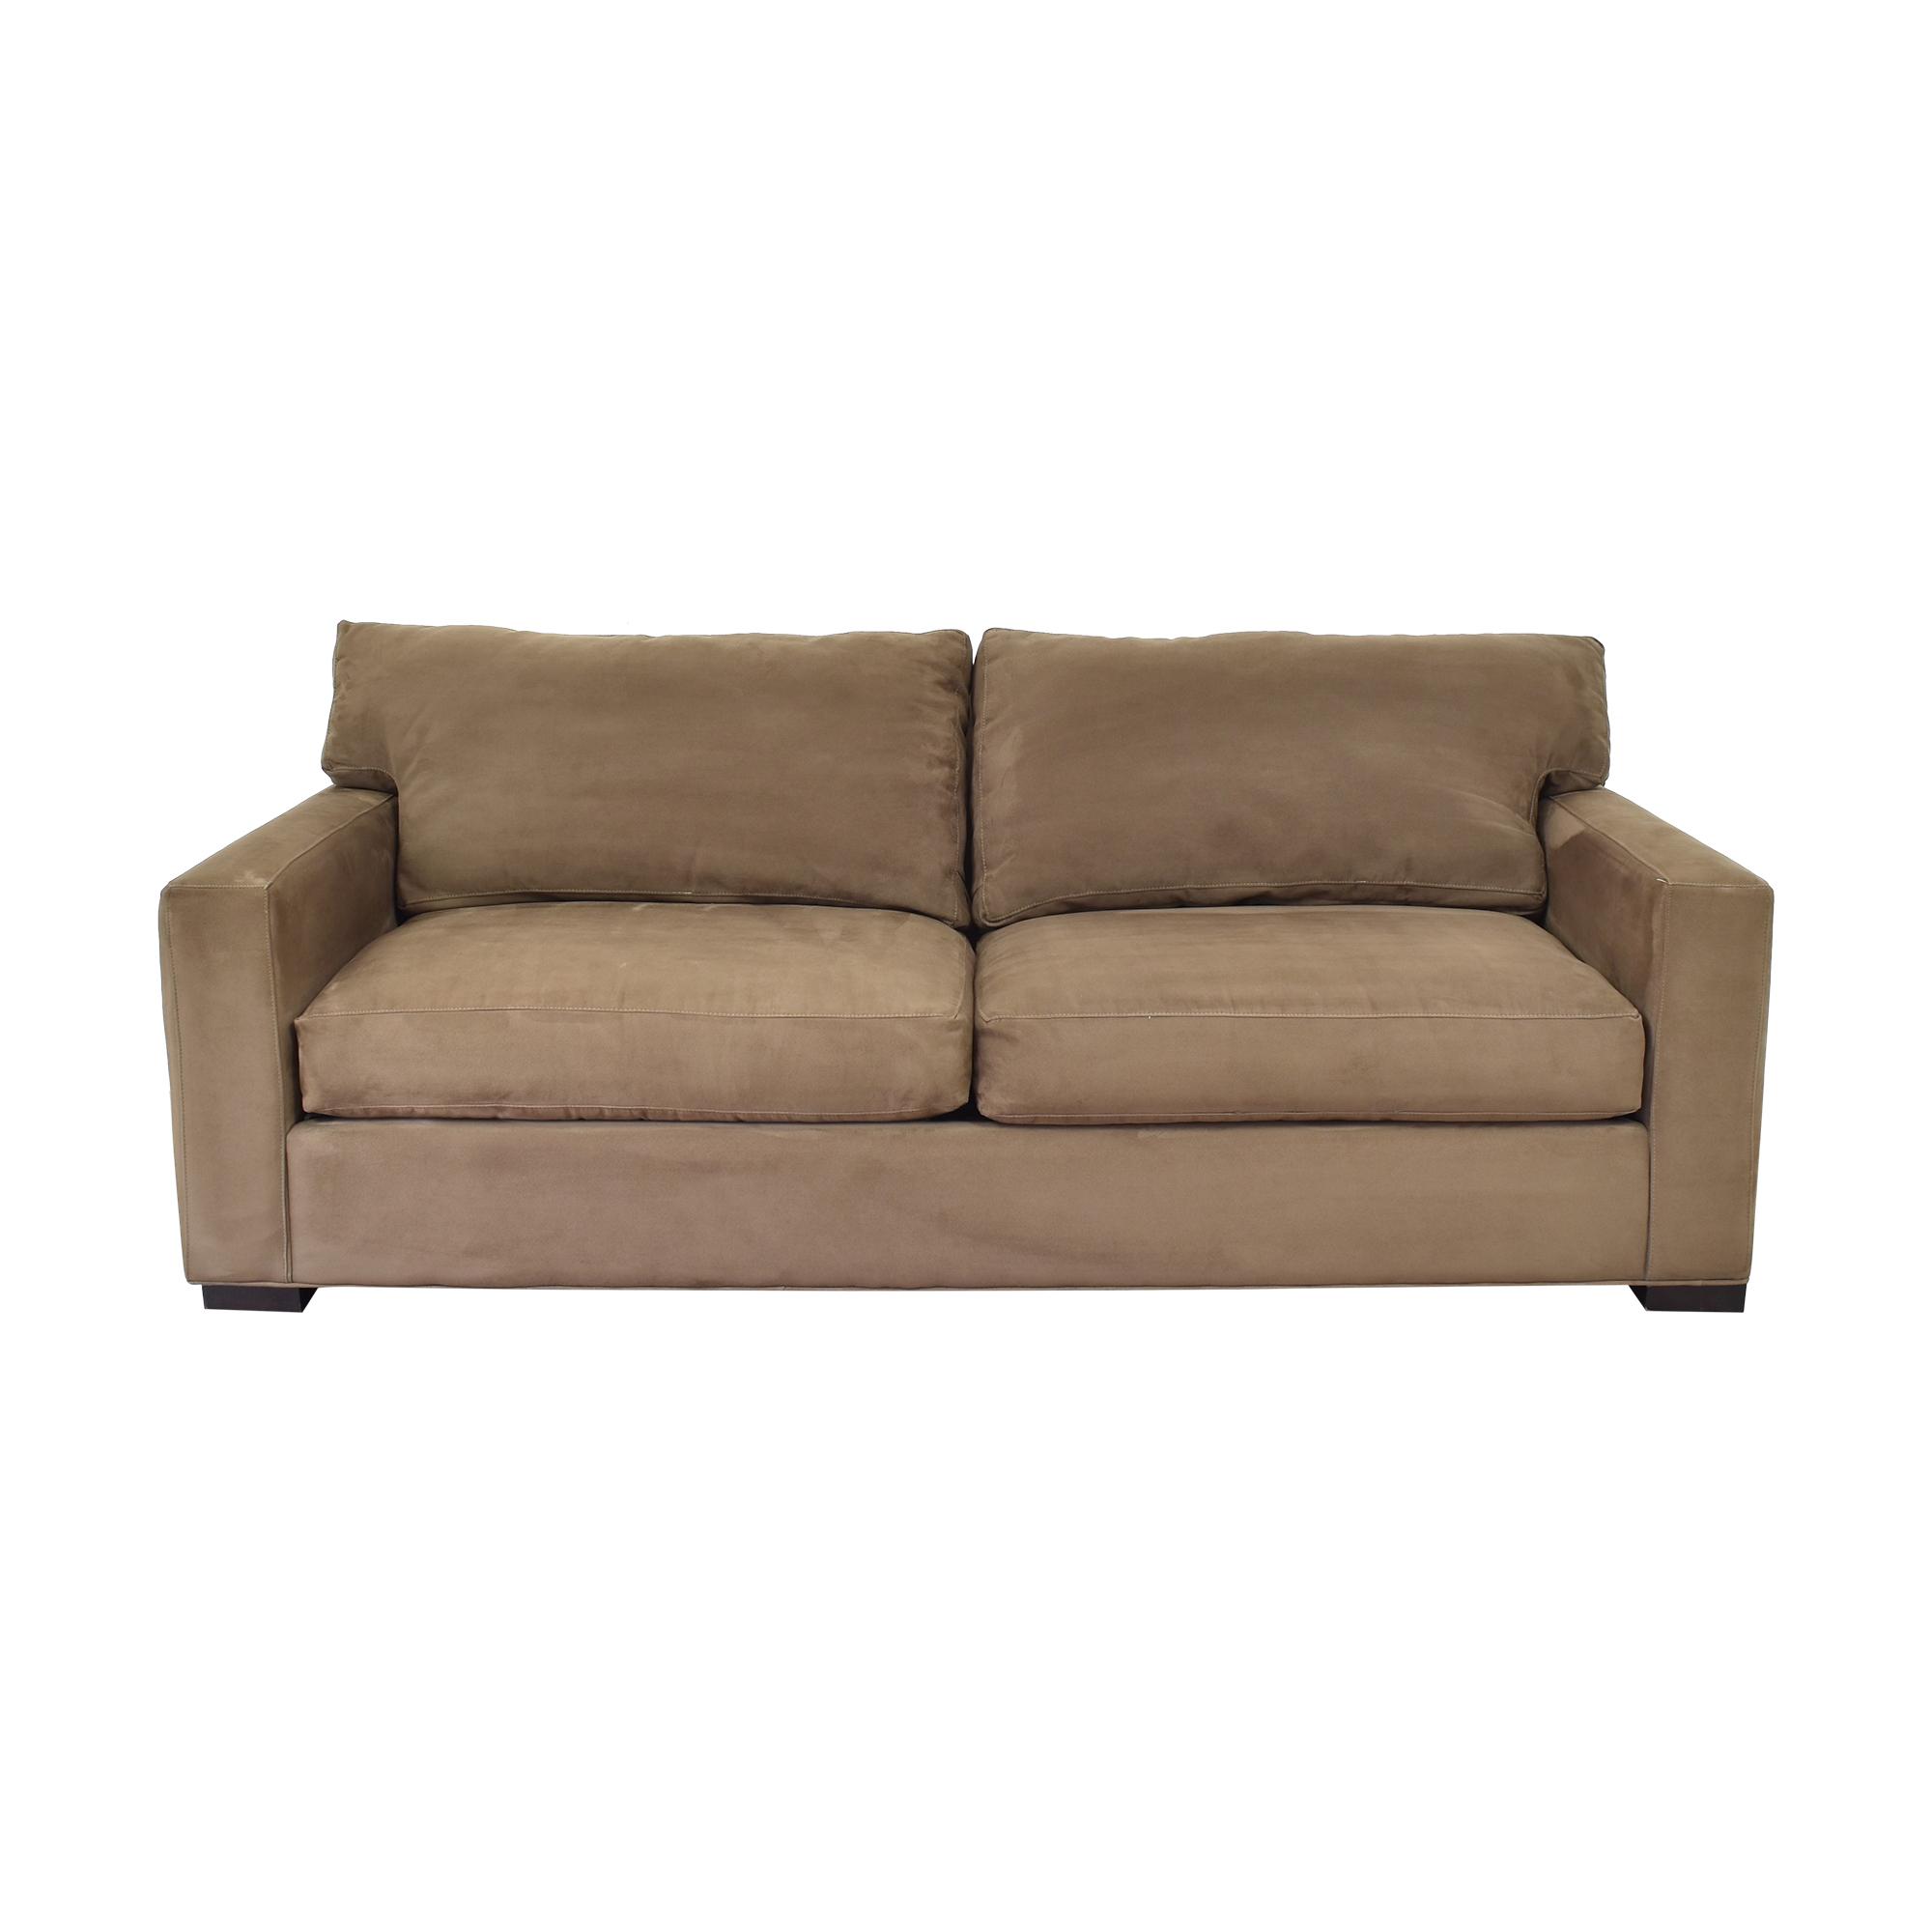 Crate & Barrel Crate & Barrel Axis Two-Seat Sofa nyc